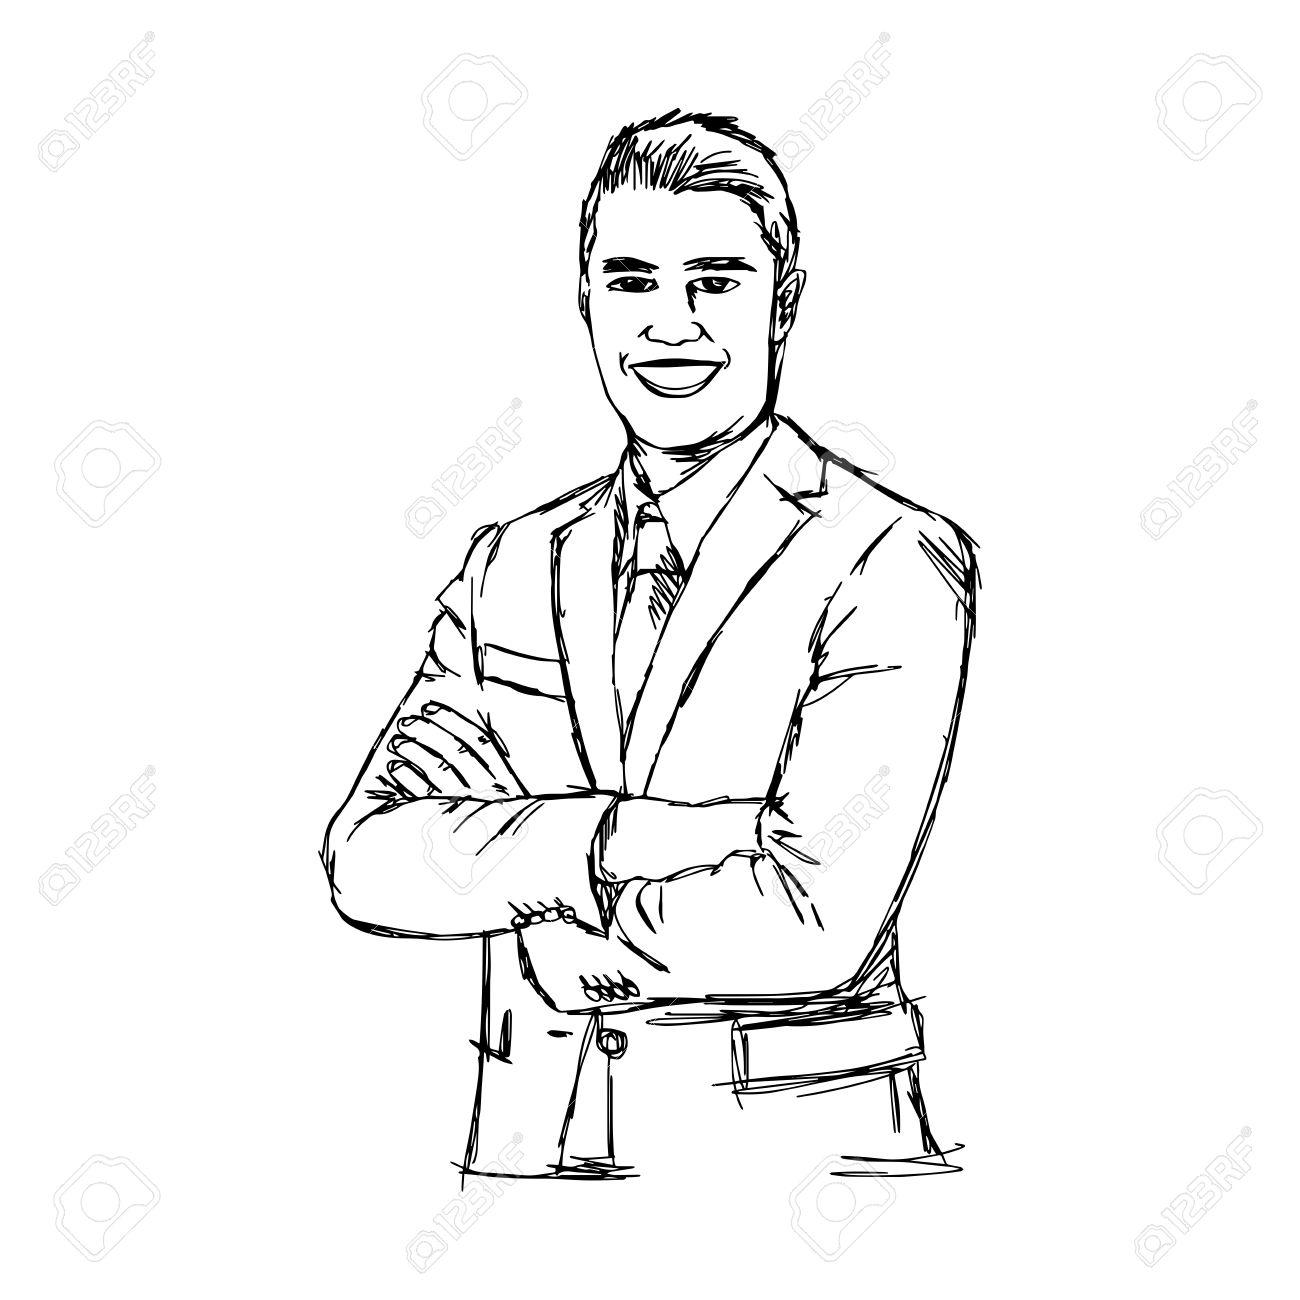 1300x1300 Illustration Doodle Hand Drawn Of Sketch Smiling Businessman